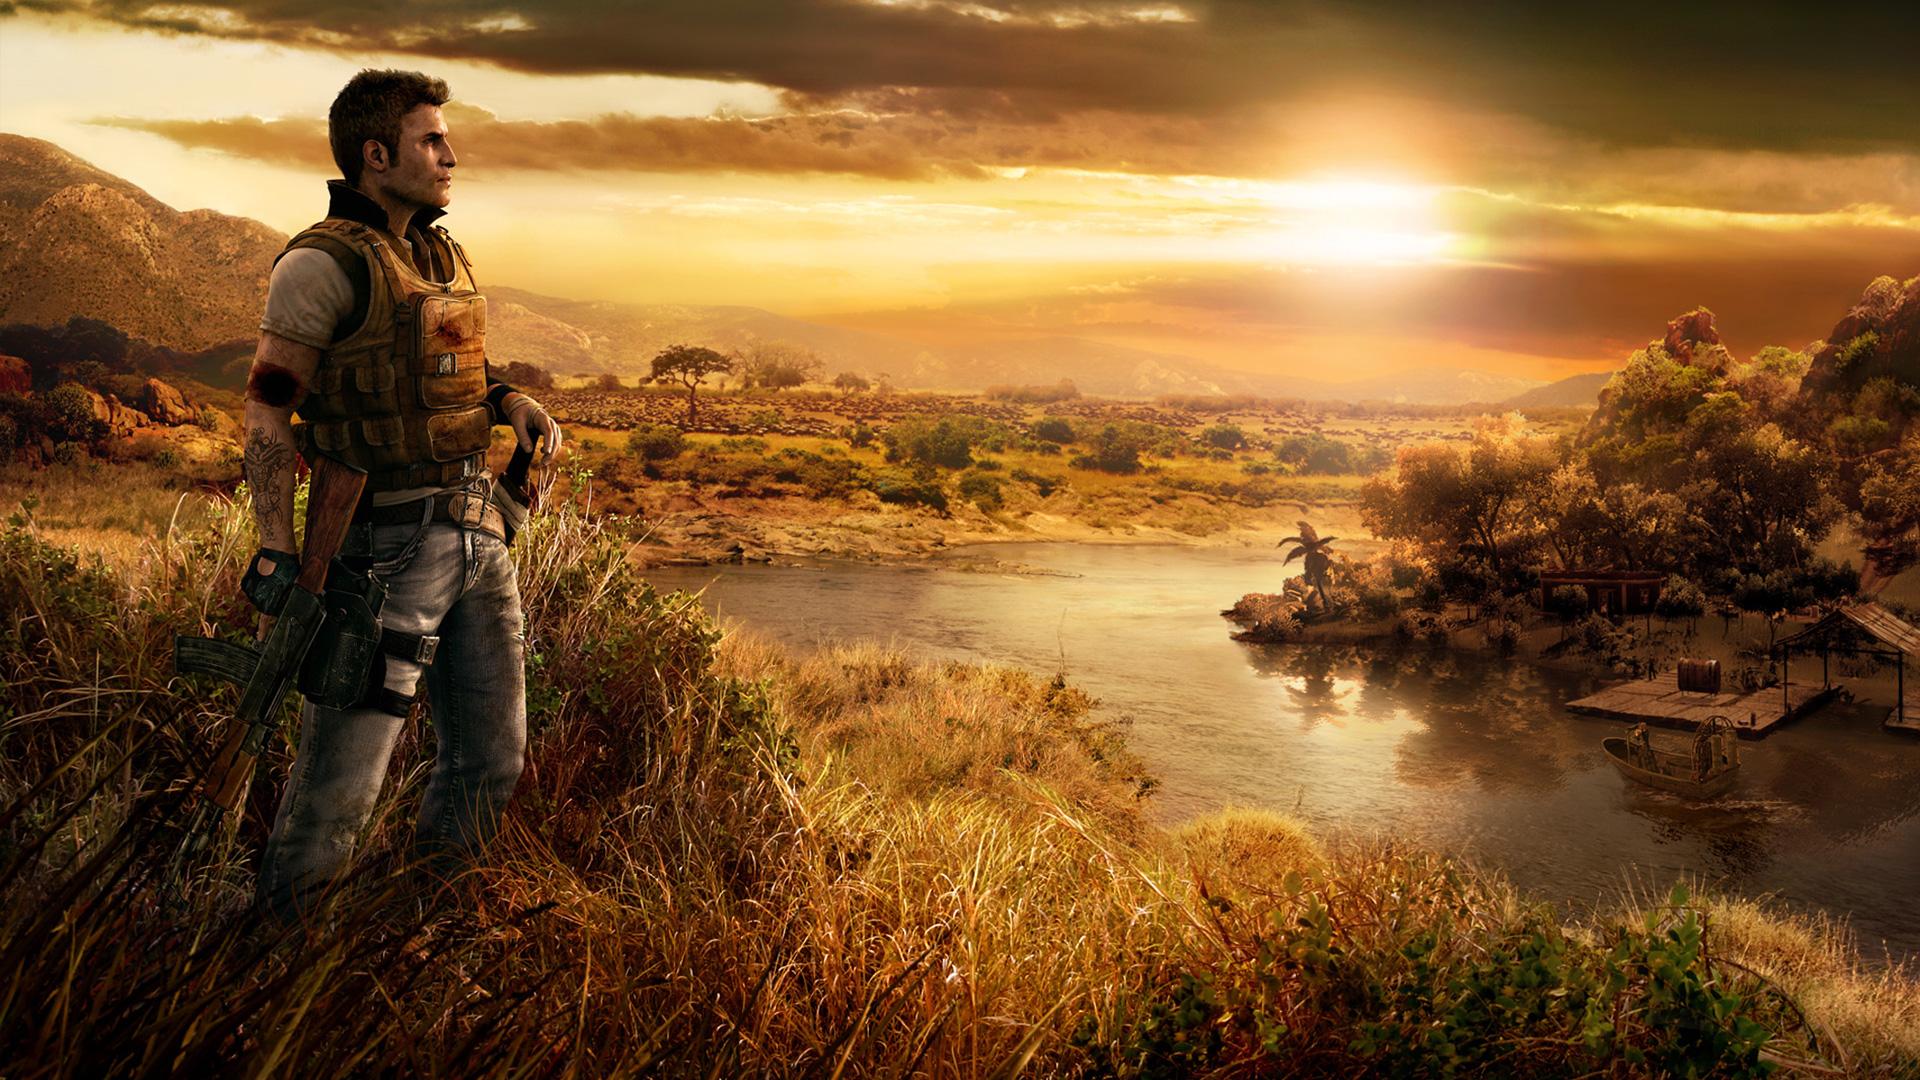 Far Cry 2 Wallpaper in 1920x1080